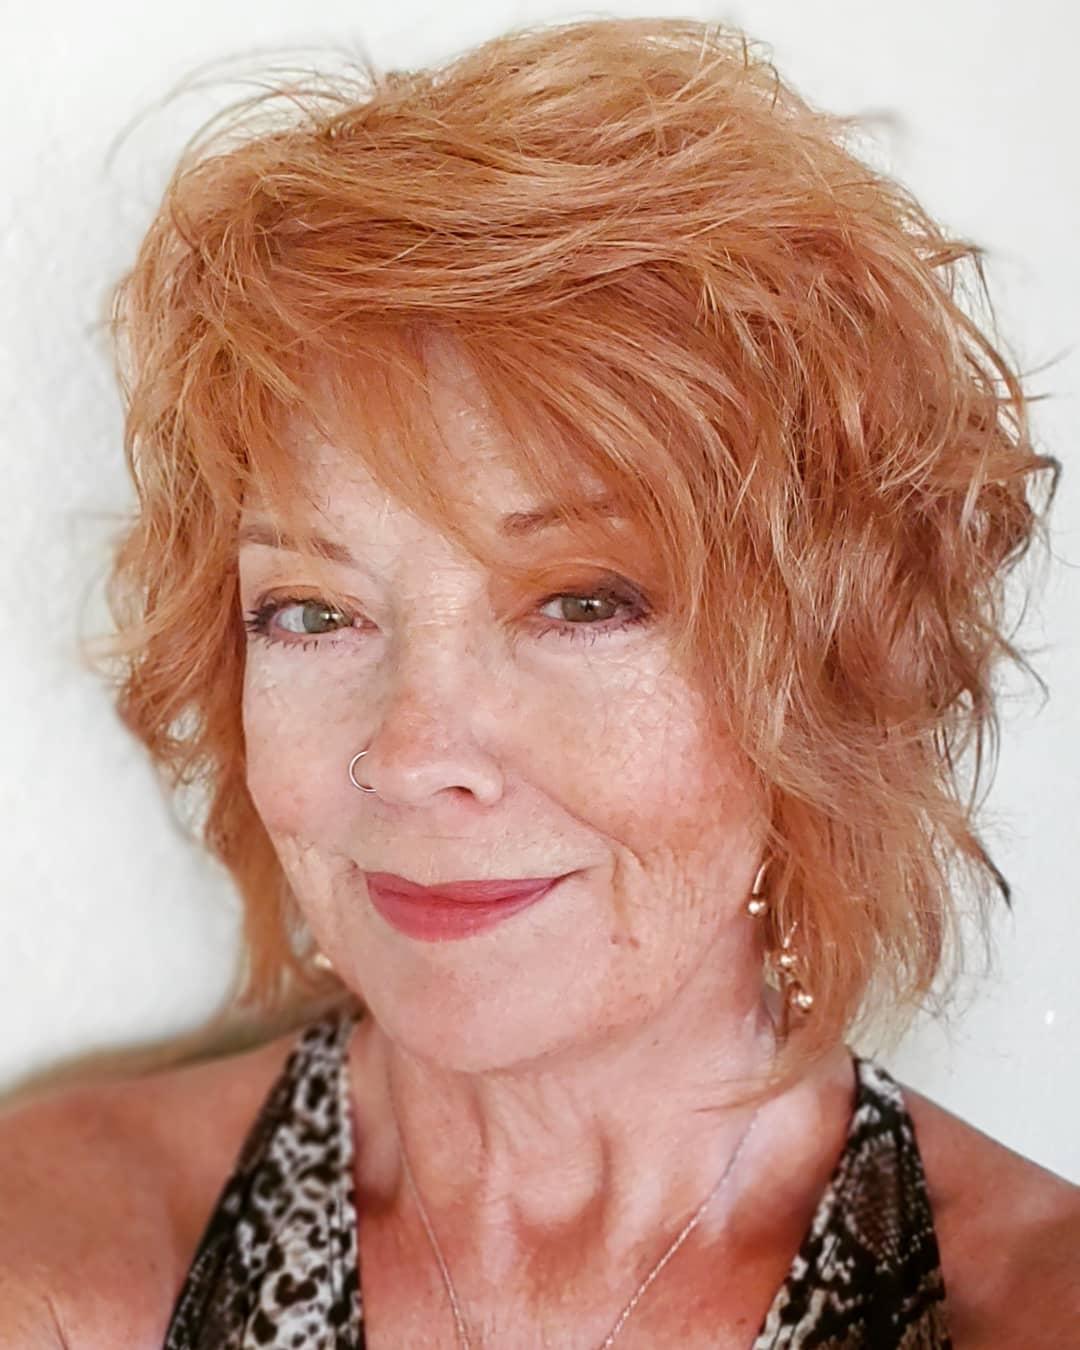 Textured shag haircut for women over 60